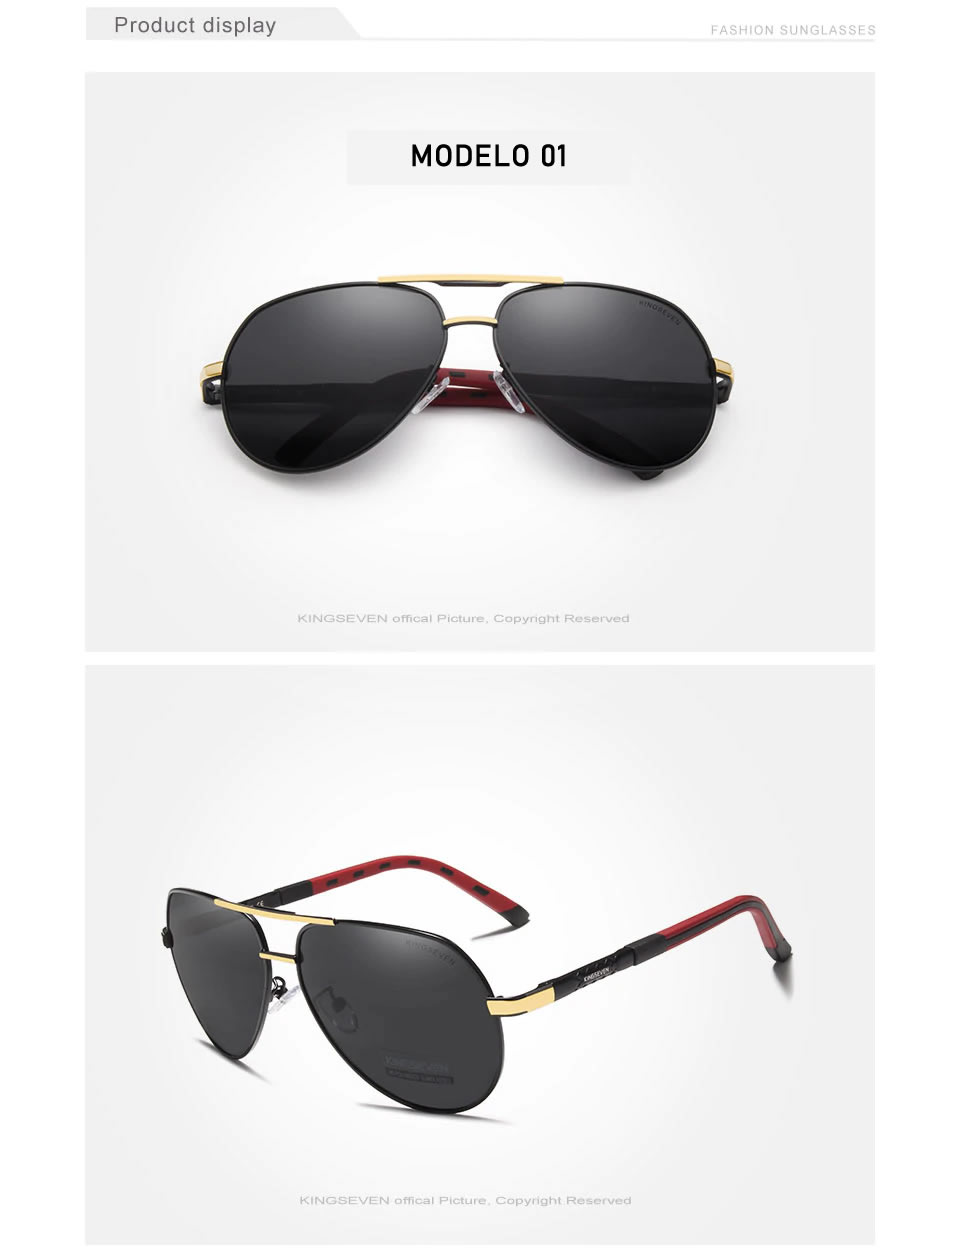 Óculos de sol Masculino Polarizado Magnésio KingSeven N725 Ouro Preto